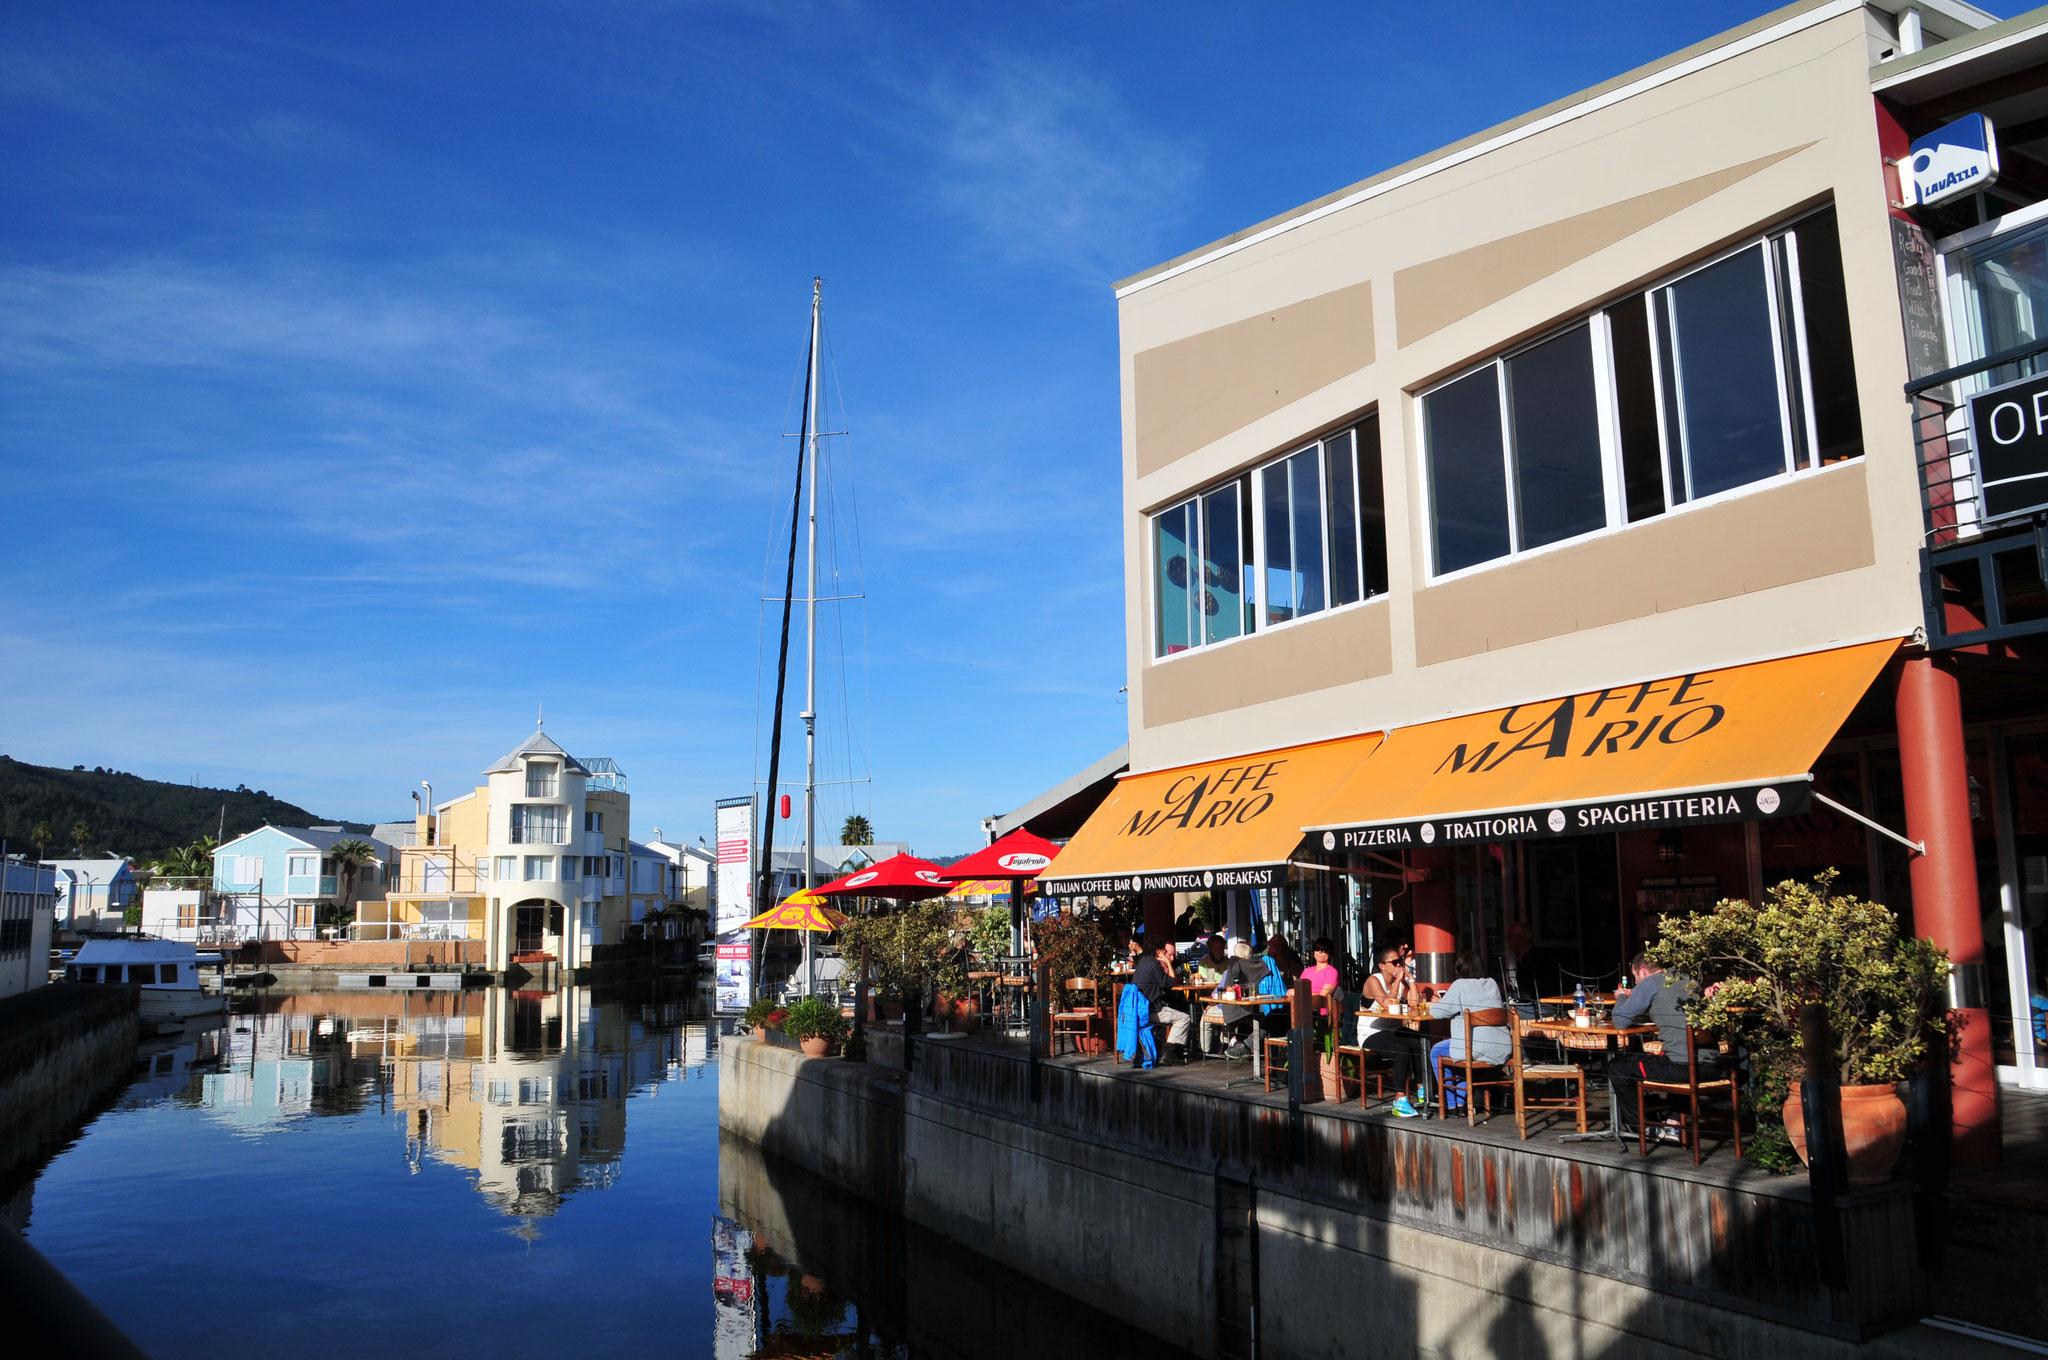 Am Nachmittag in Knysna (Waterfront) bei Mario - Penne Rucola und Spaghetti Bolognese